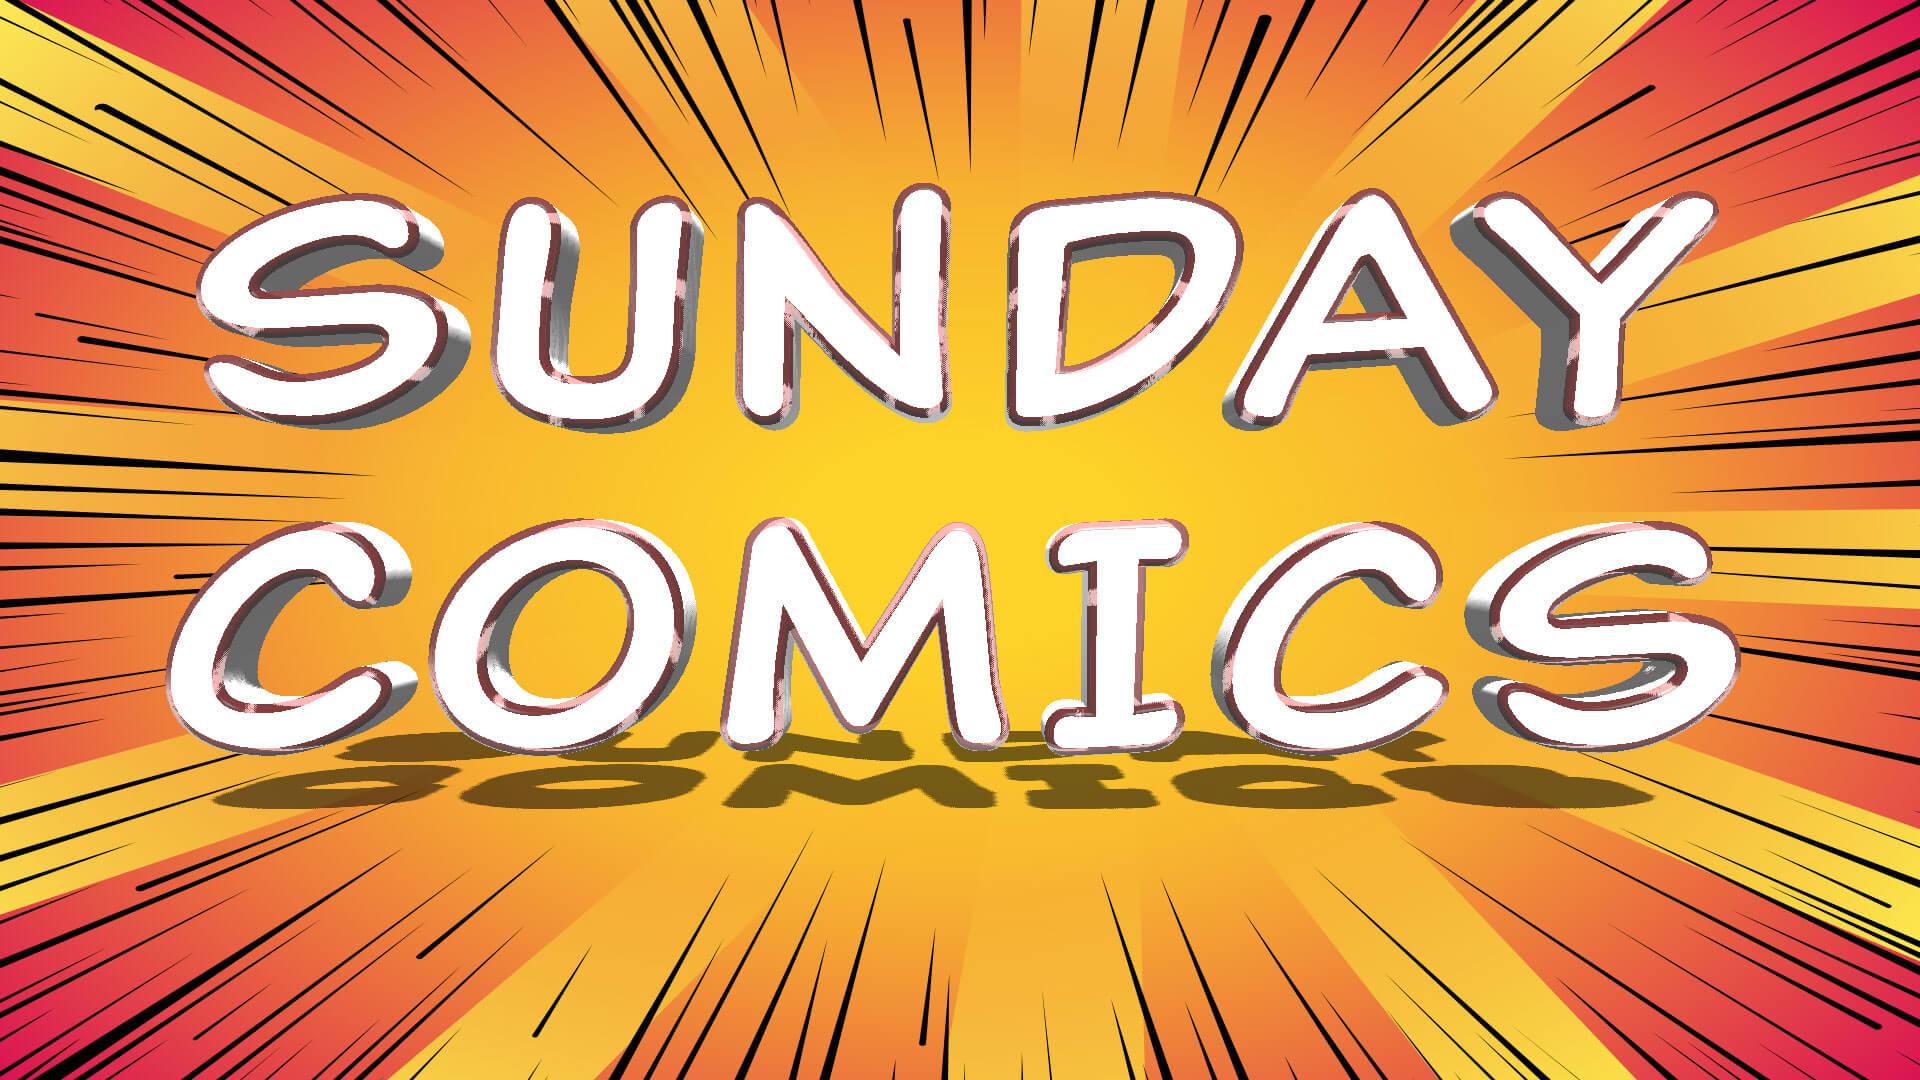 Sunday Comics humor from Photofocus